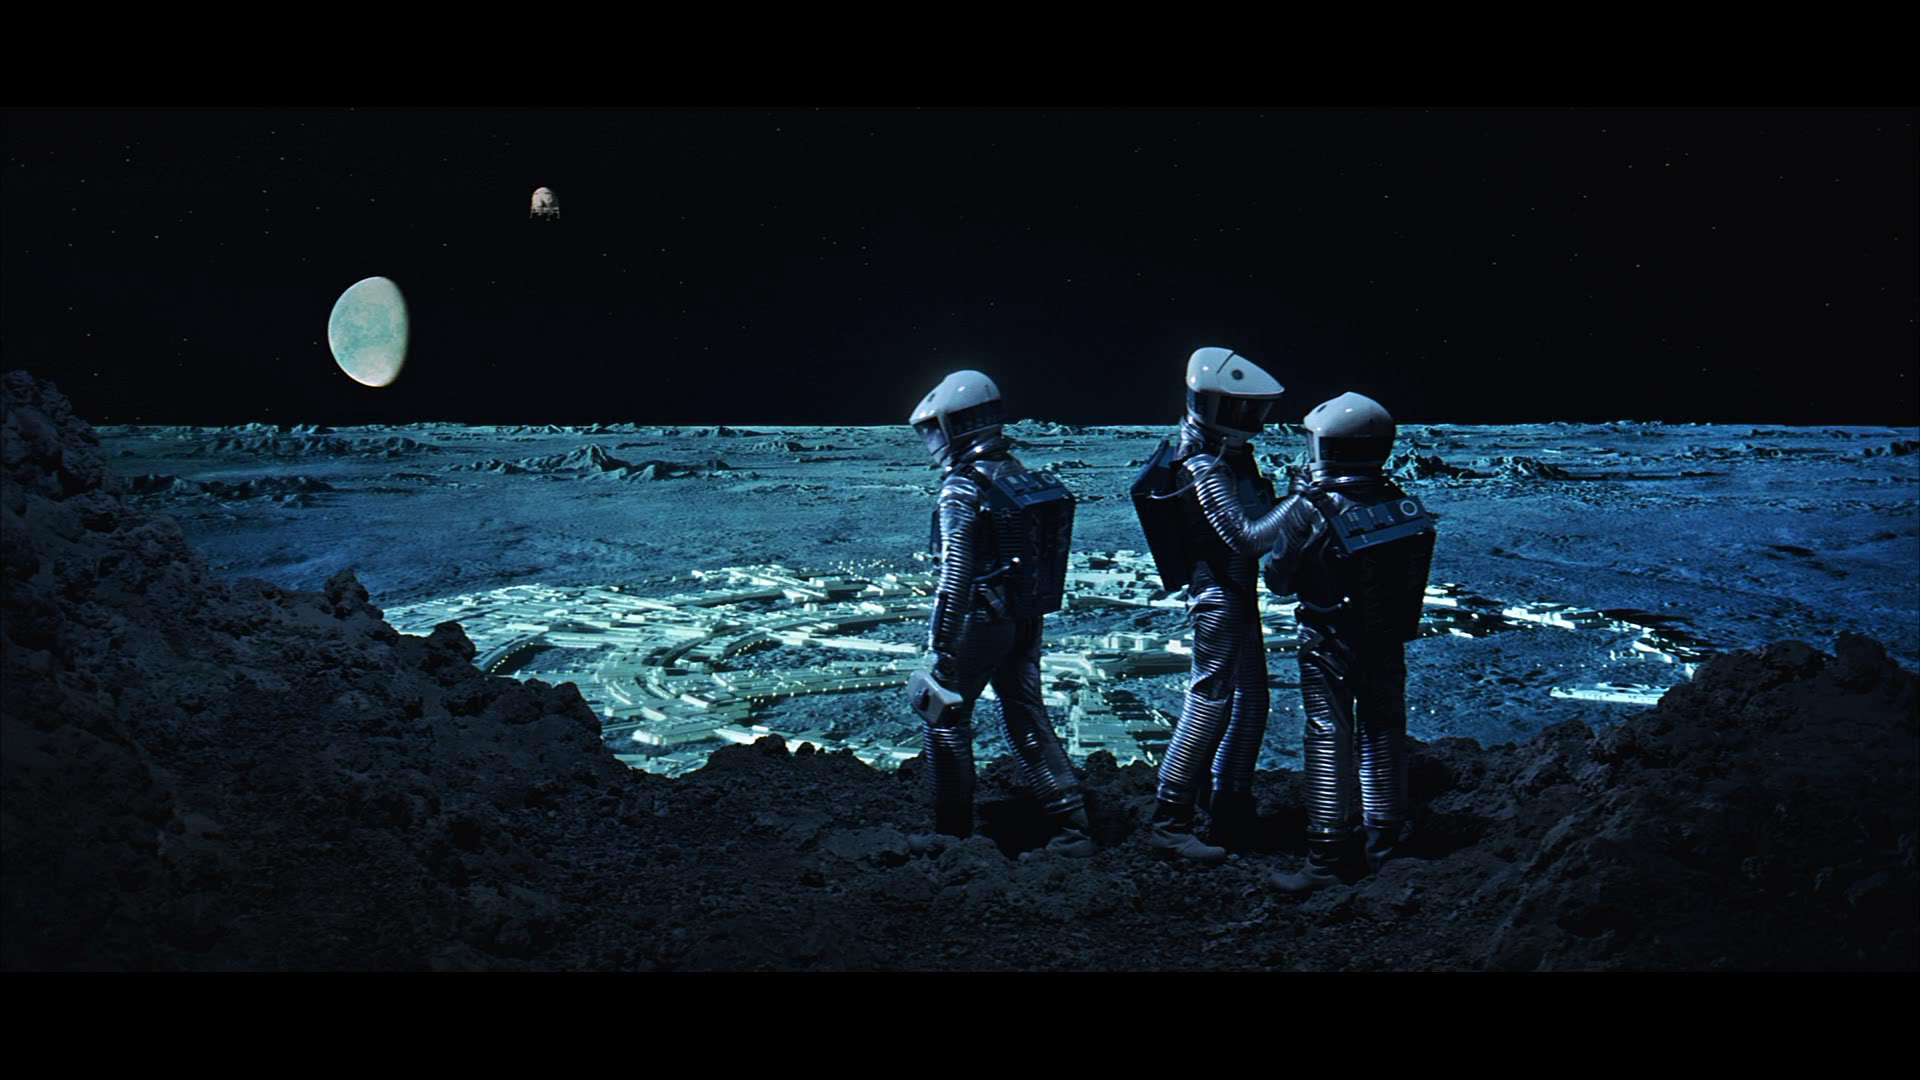 Science Fiction Wallpaper Hd Astronauts science wallpaper 1920x1080